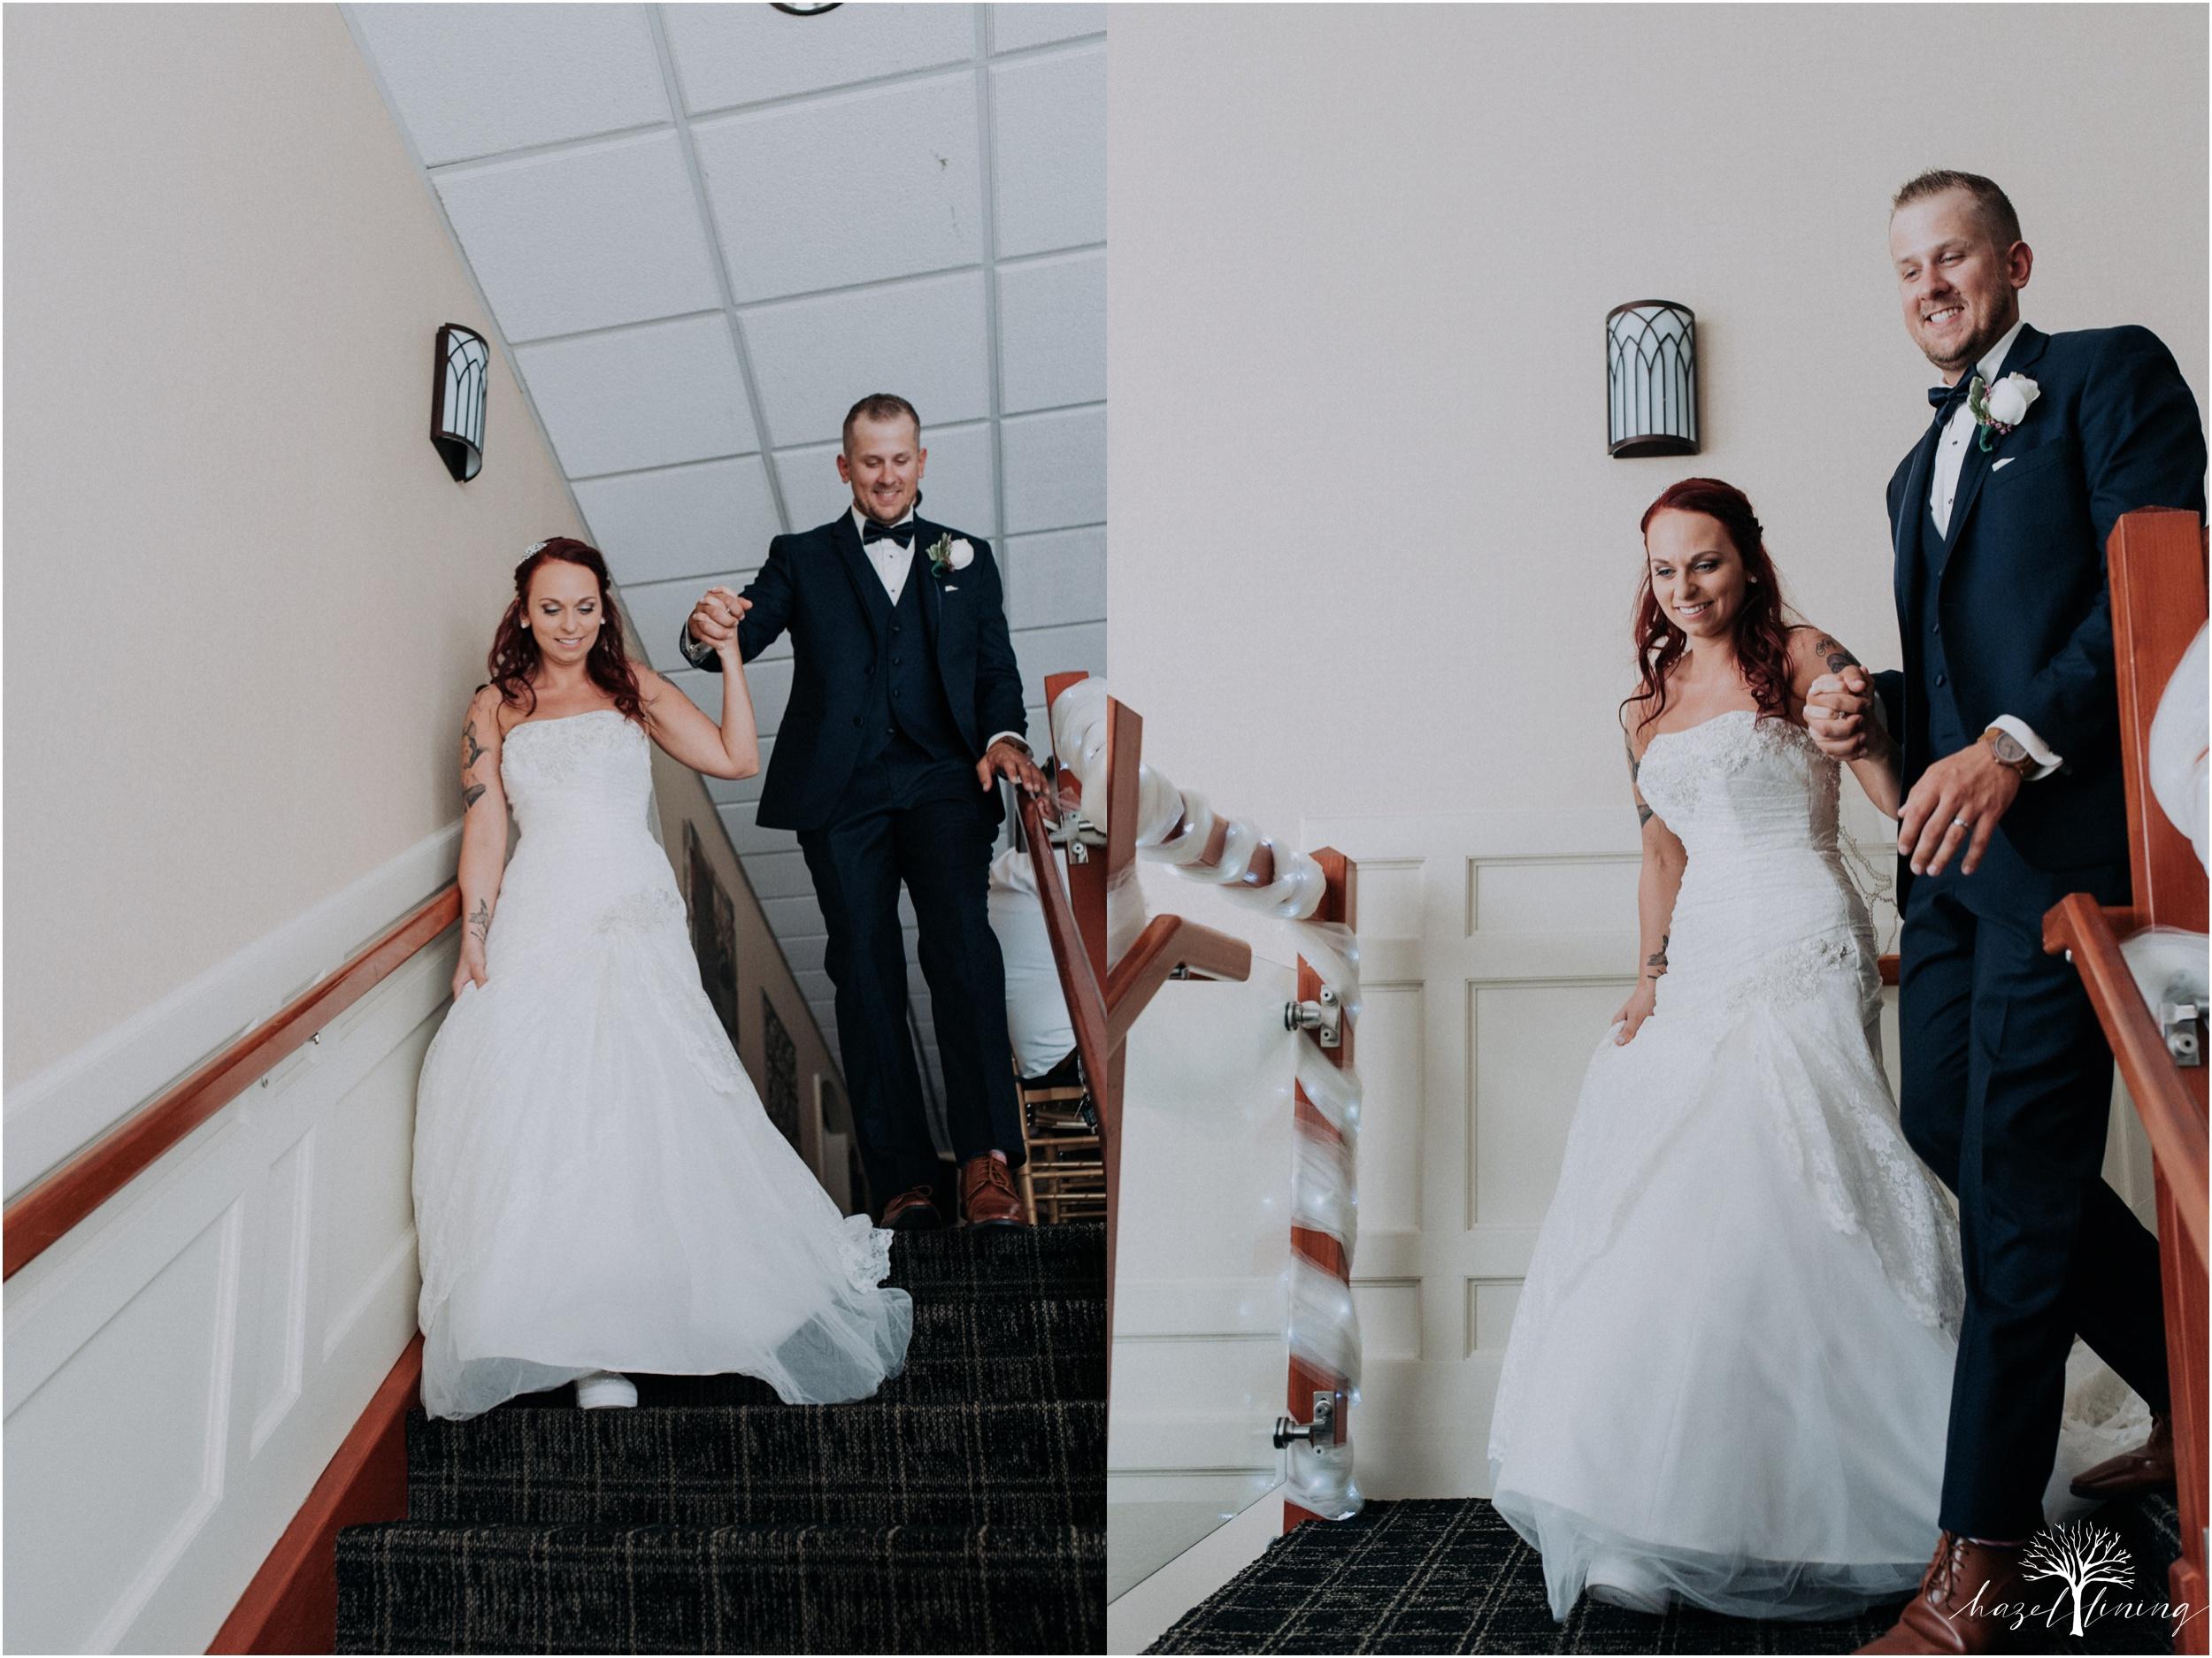 alyssa-james-stiteler-wedding-loft-and-sweet-water-cc-pennsburg-pennsylvania-hazel-lining-travel-wedding-elopement-photography_0118.jpg